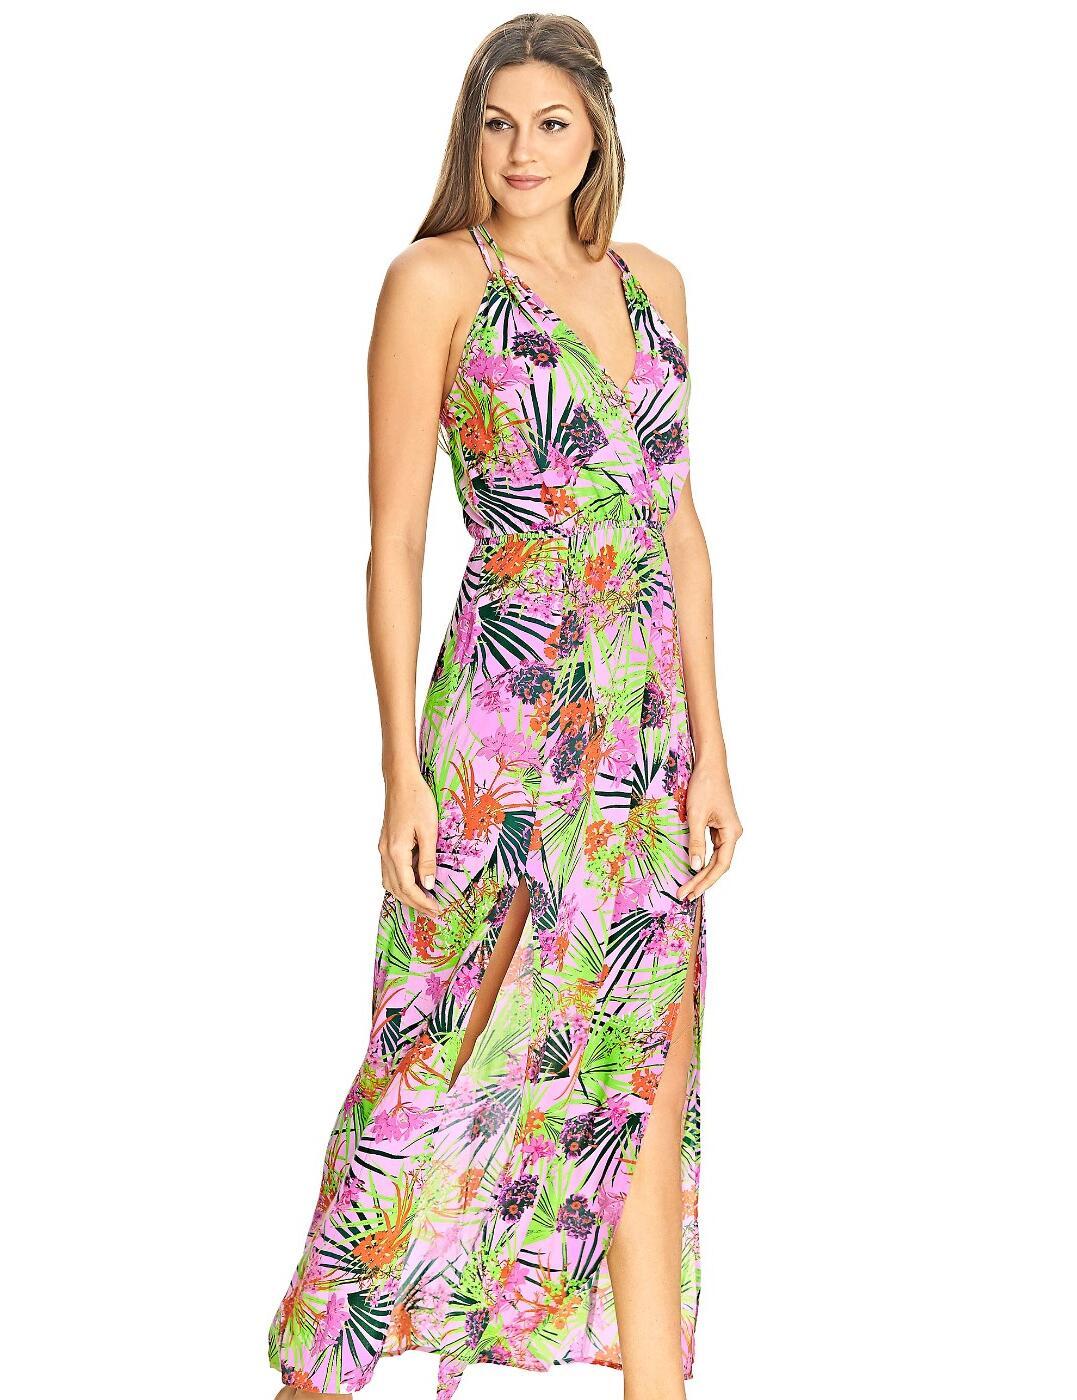 4028 Freya Lost In Paradise Maxi Beach Dress - 4028 Pink